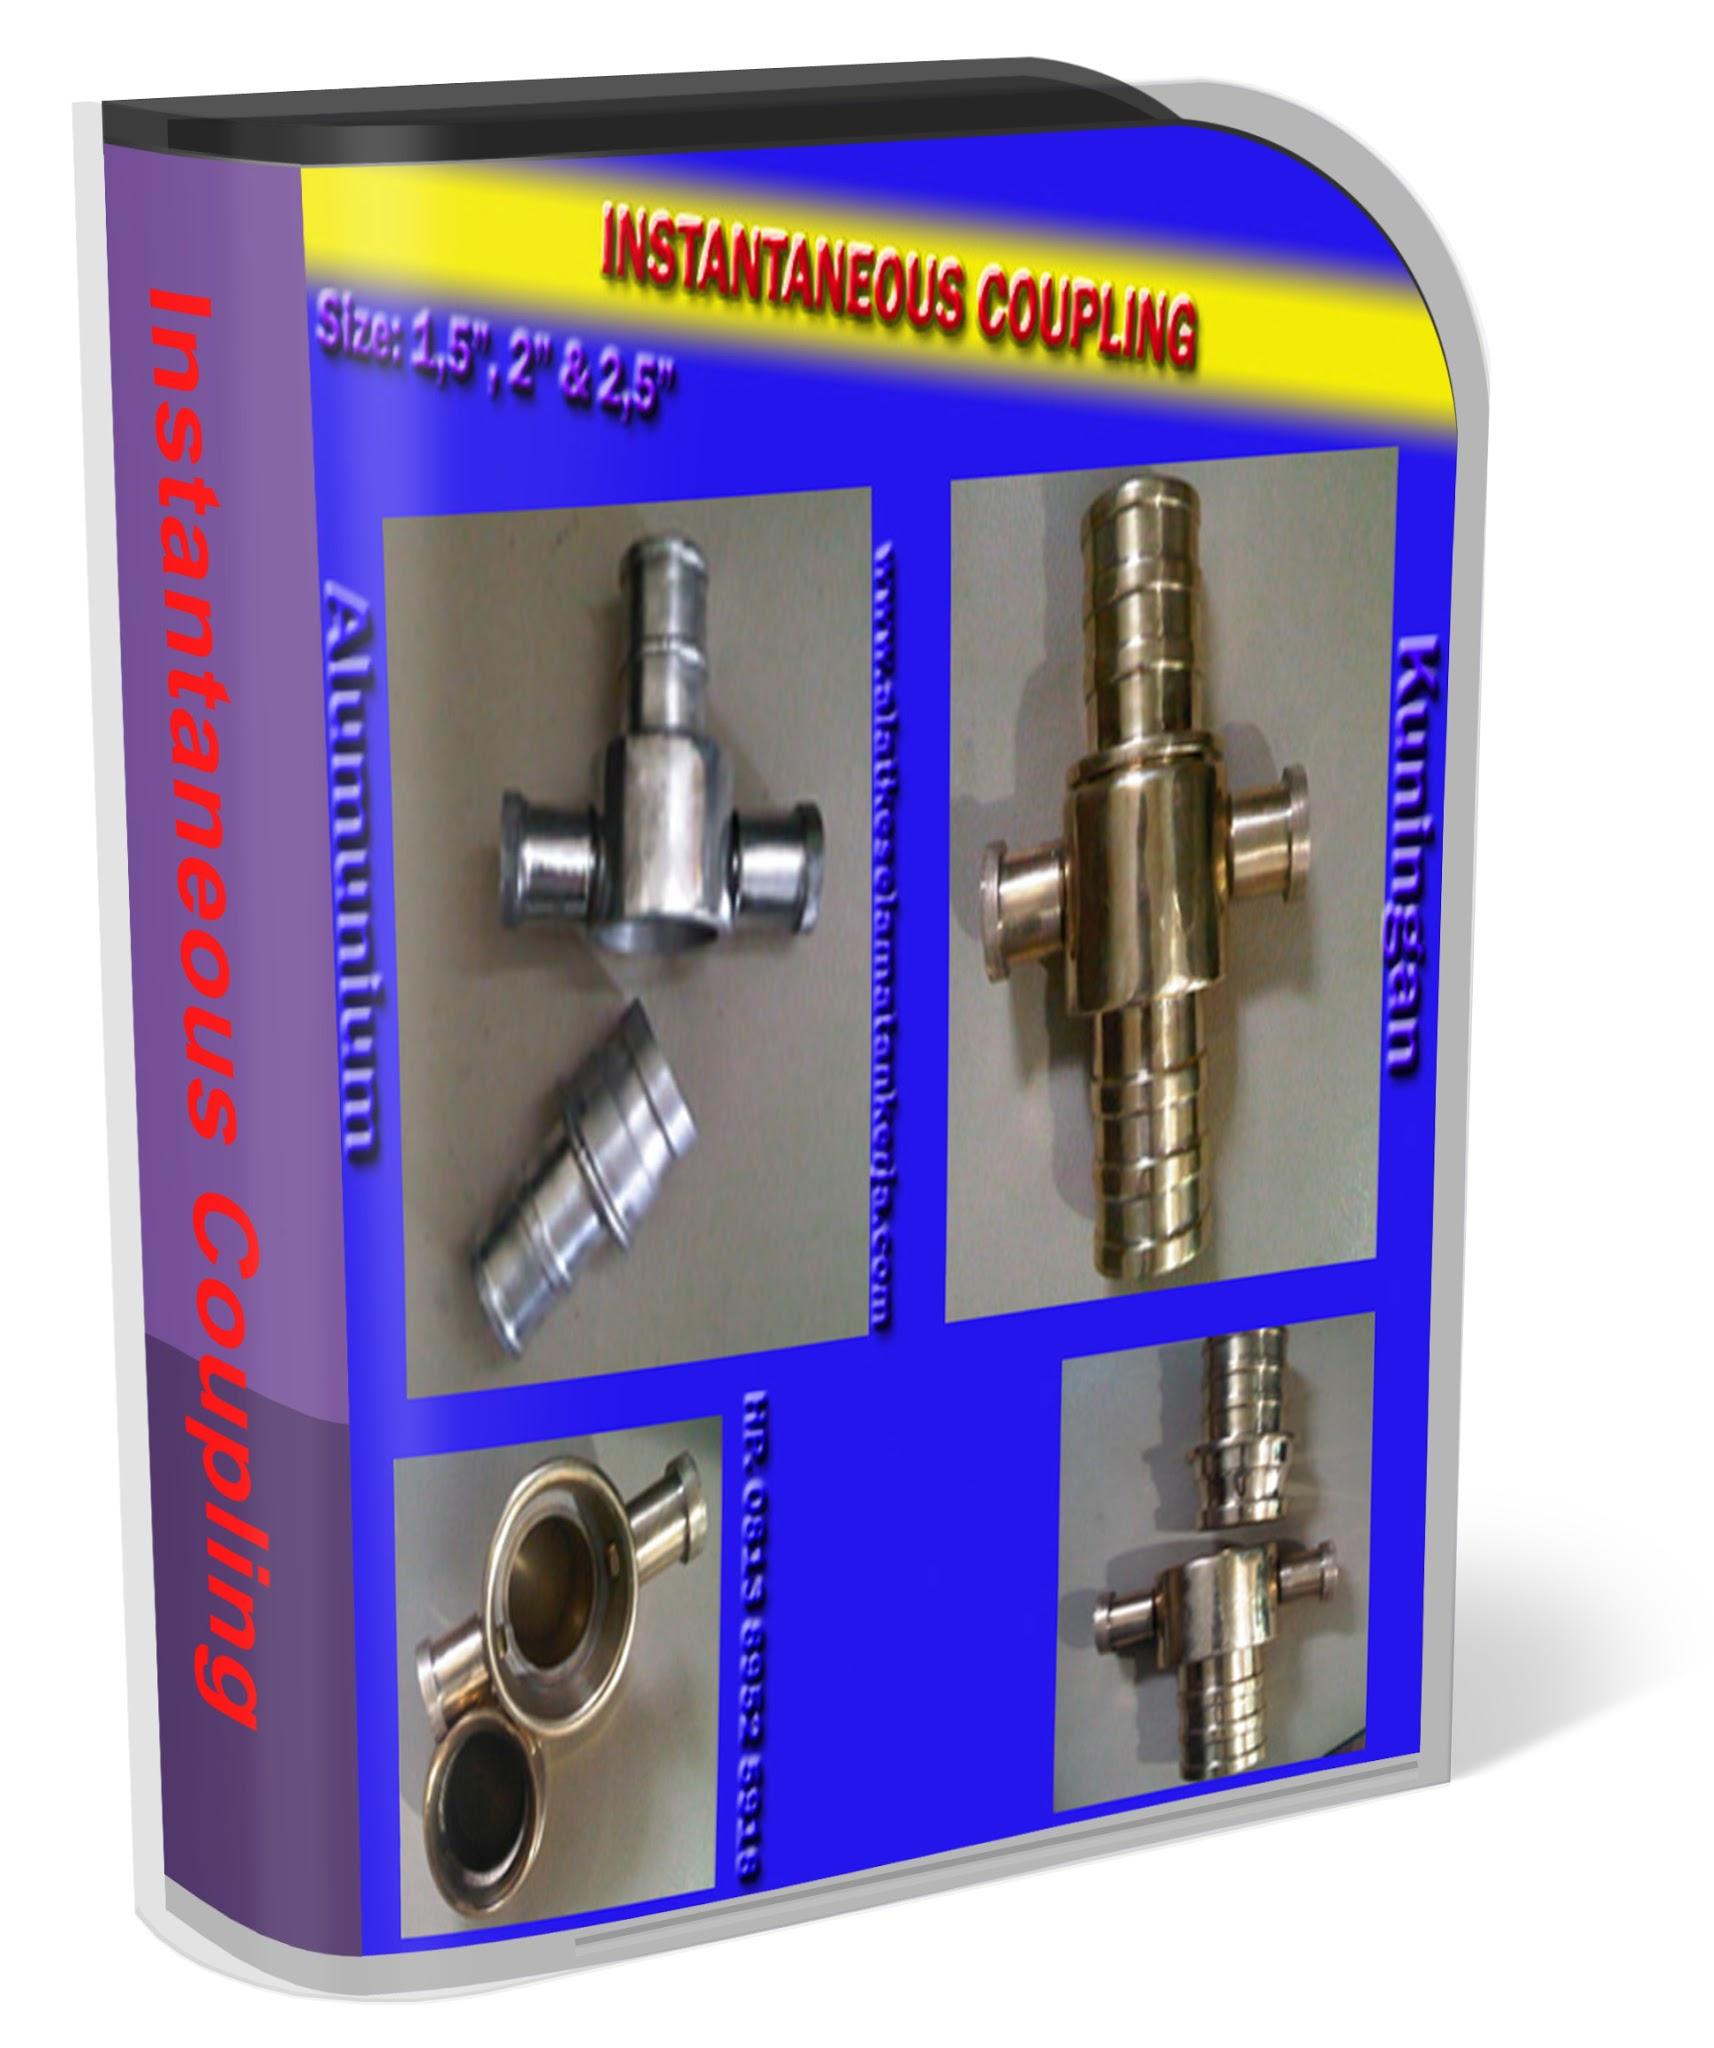 coupling, coupling hydrant, hydrant coupling, instantaneous coupling, instantaneous hydrant, jenis jenis coupling, jenis coupling, hydrant, adaptor coupling, instantaneous adaptor coupling, hydrant